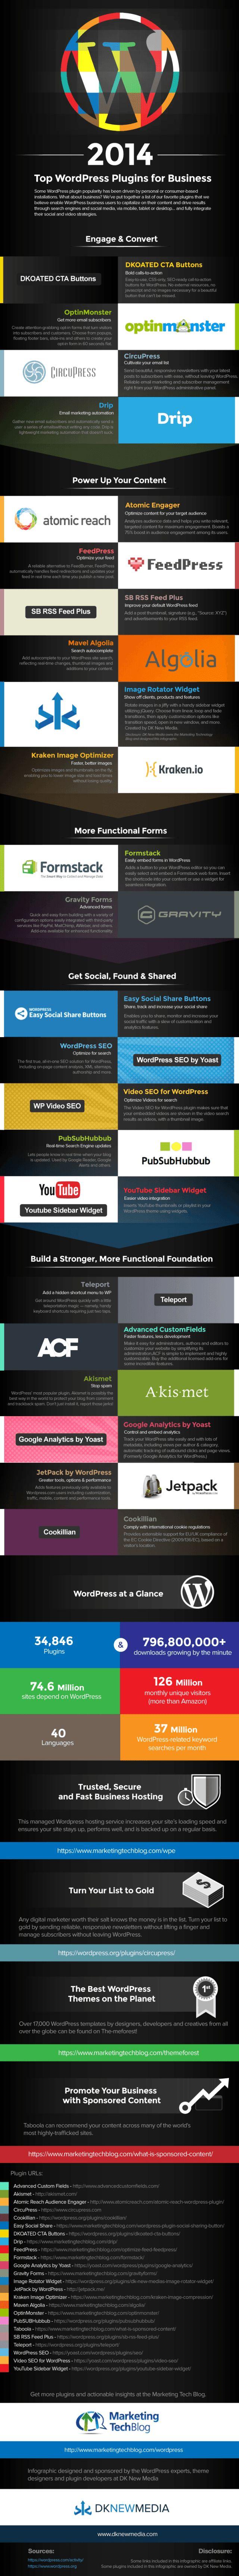 2014-wordpress-business-plugins